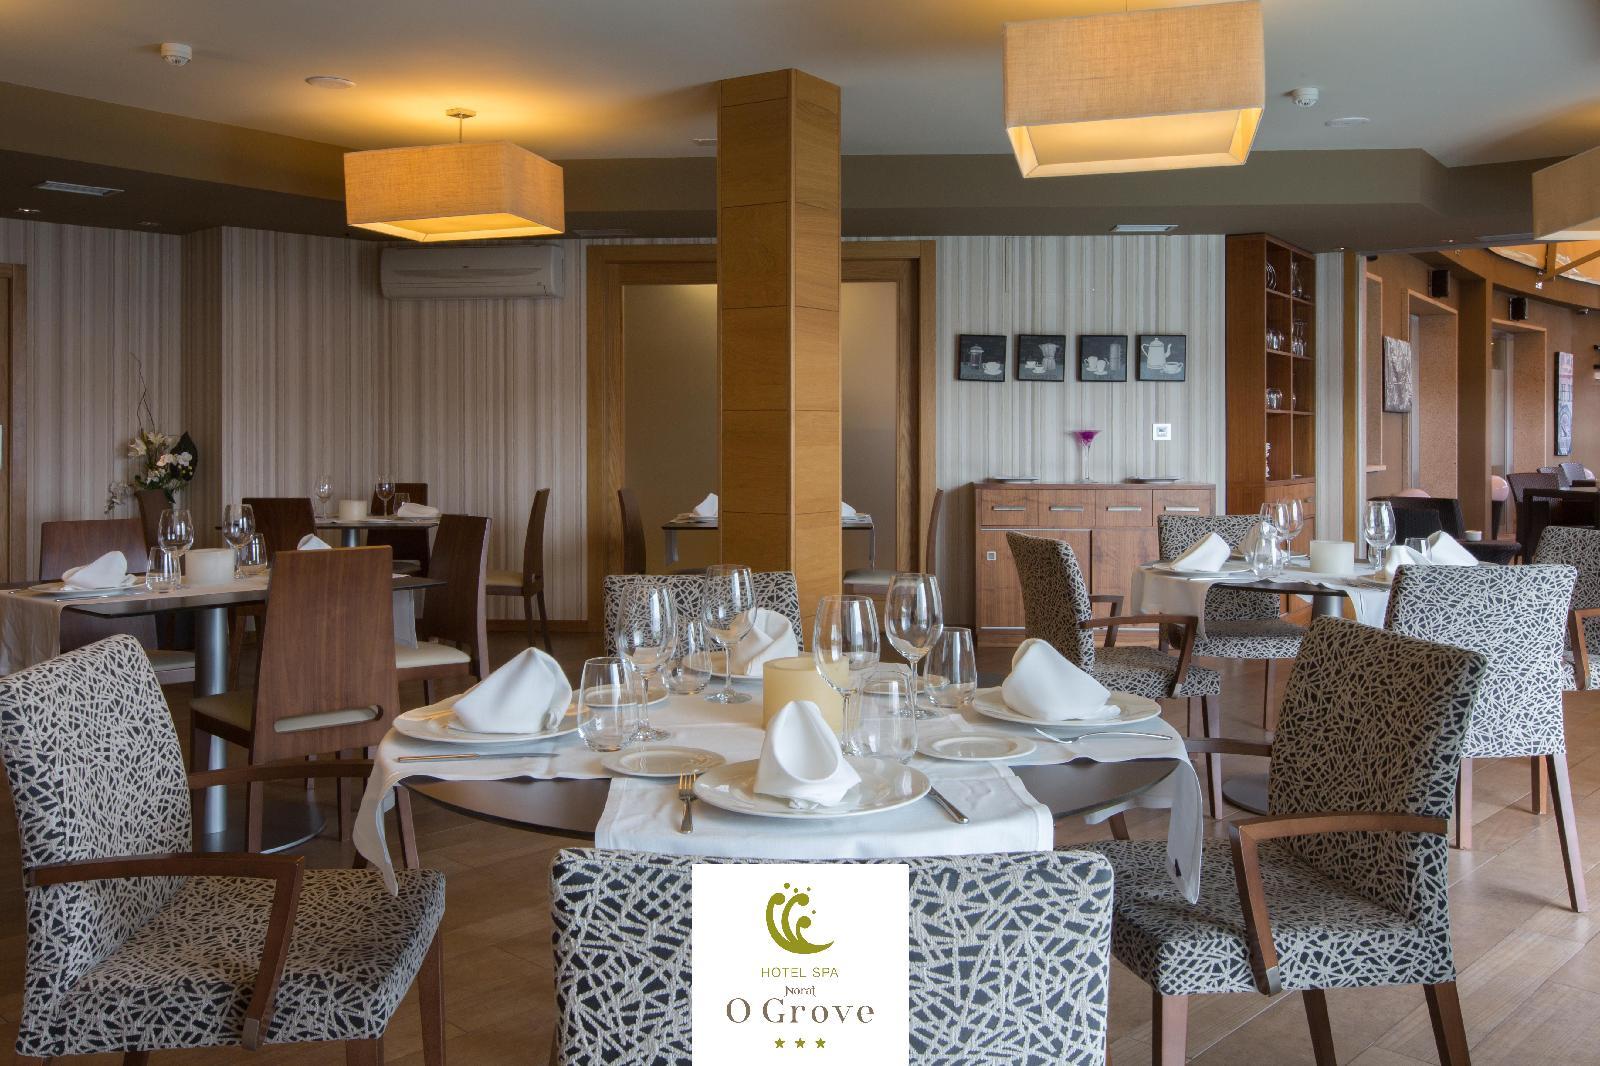 18. Hotel Spa Norat O Grove